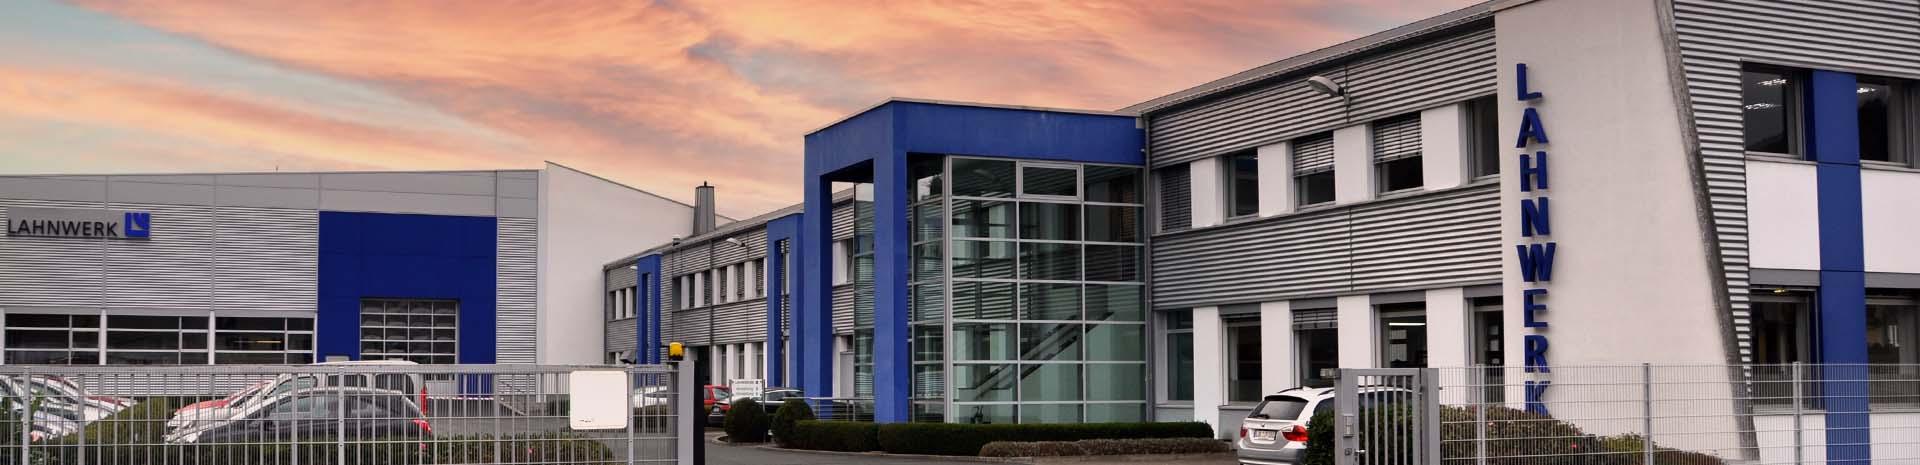 Lahnwerk GmbH Development